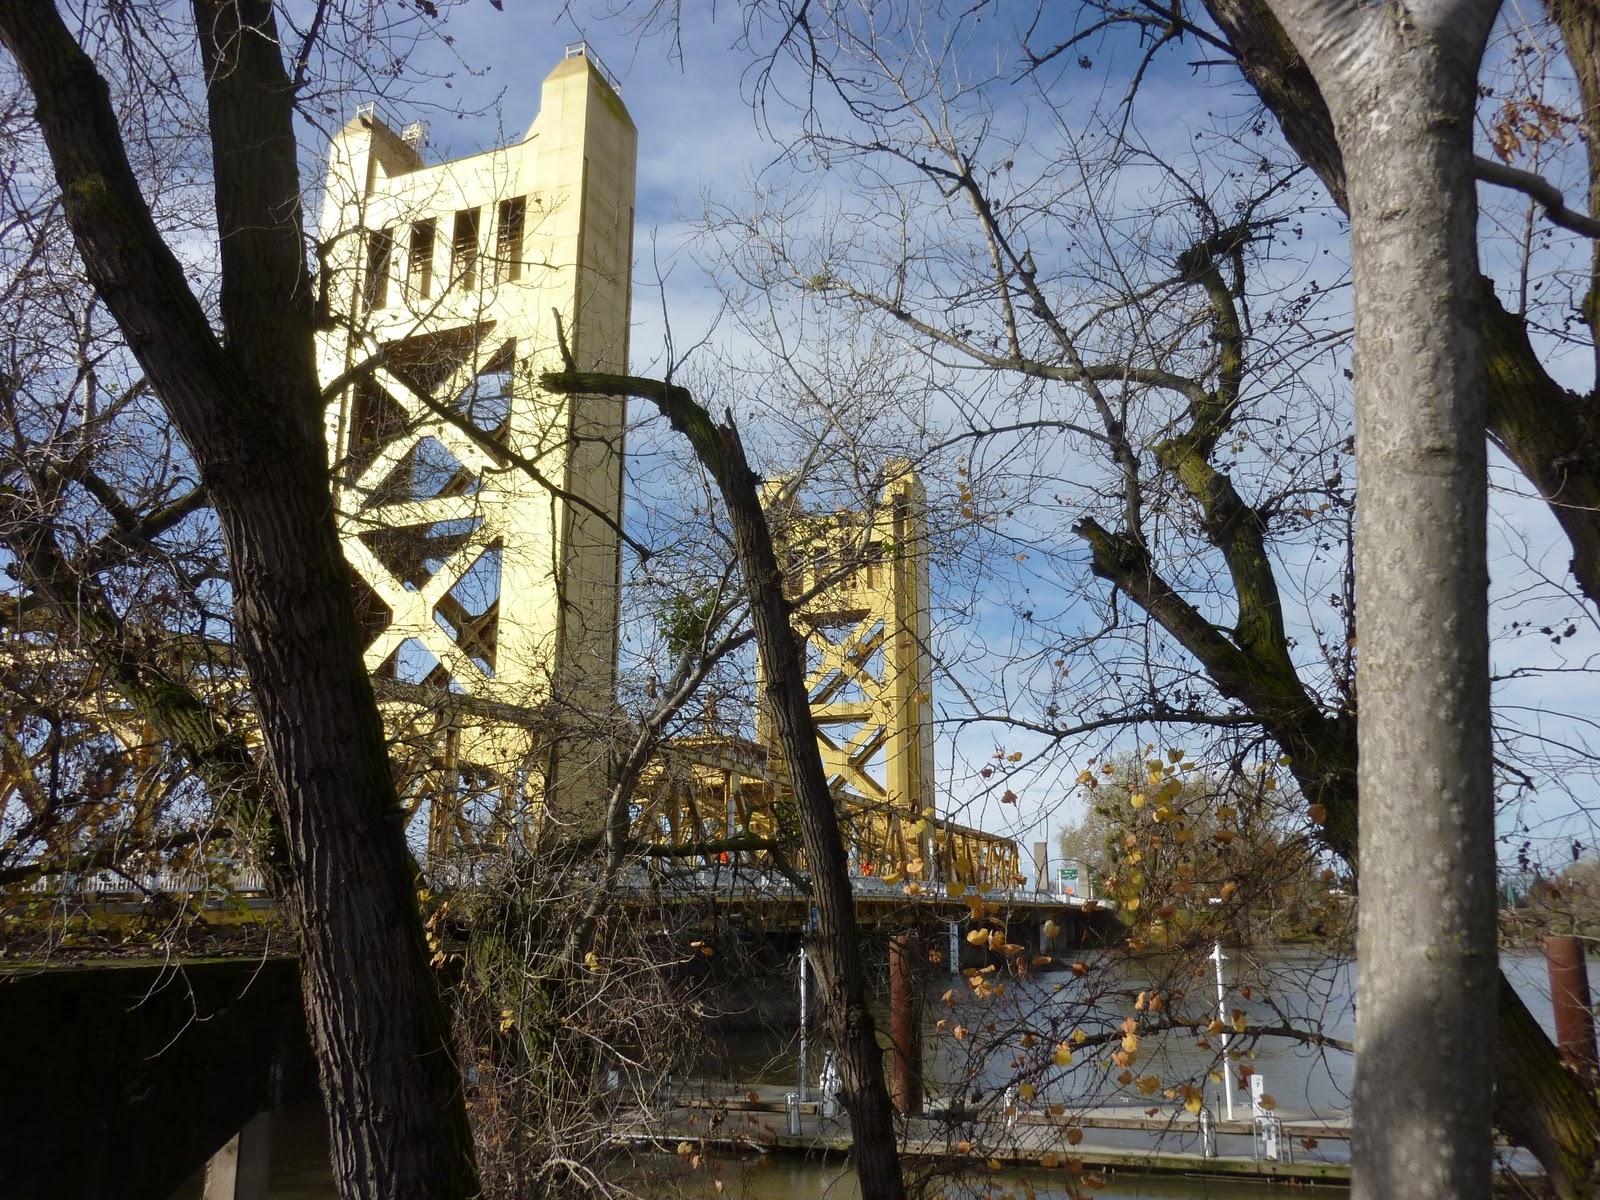 The Jürgen Chronicles: Sacramento and beyond